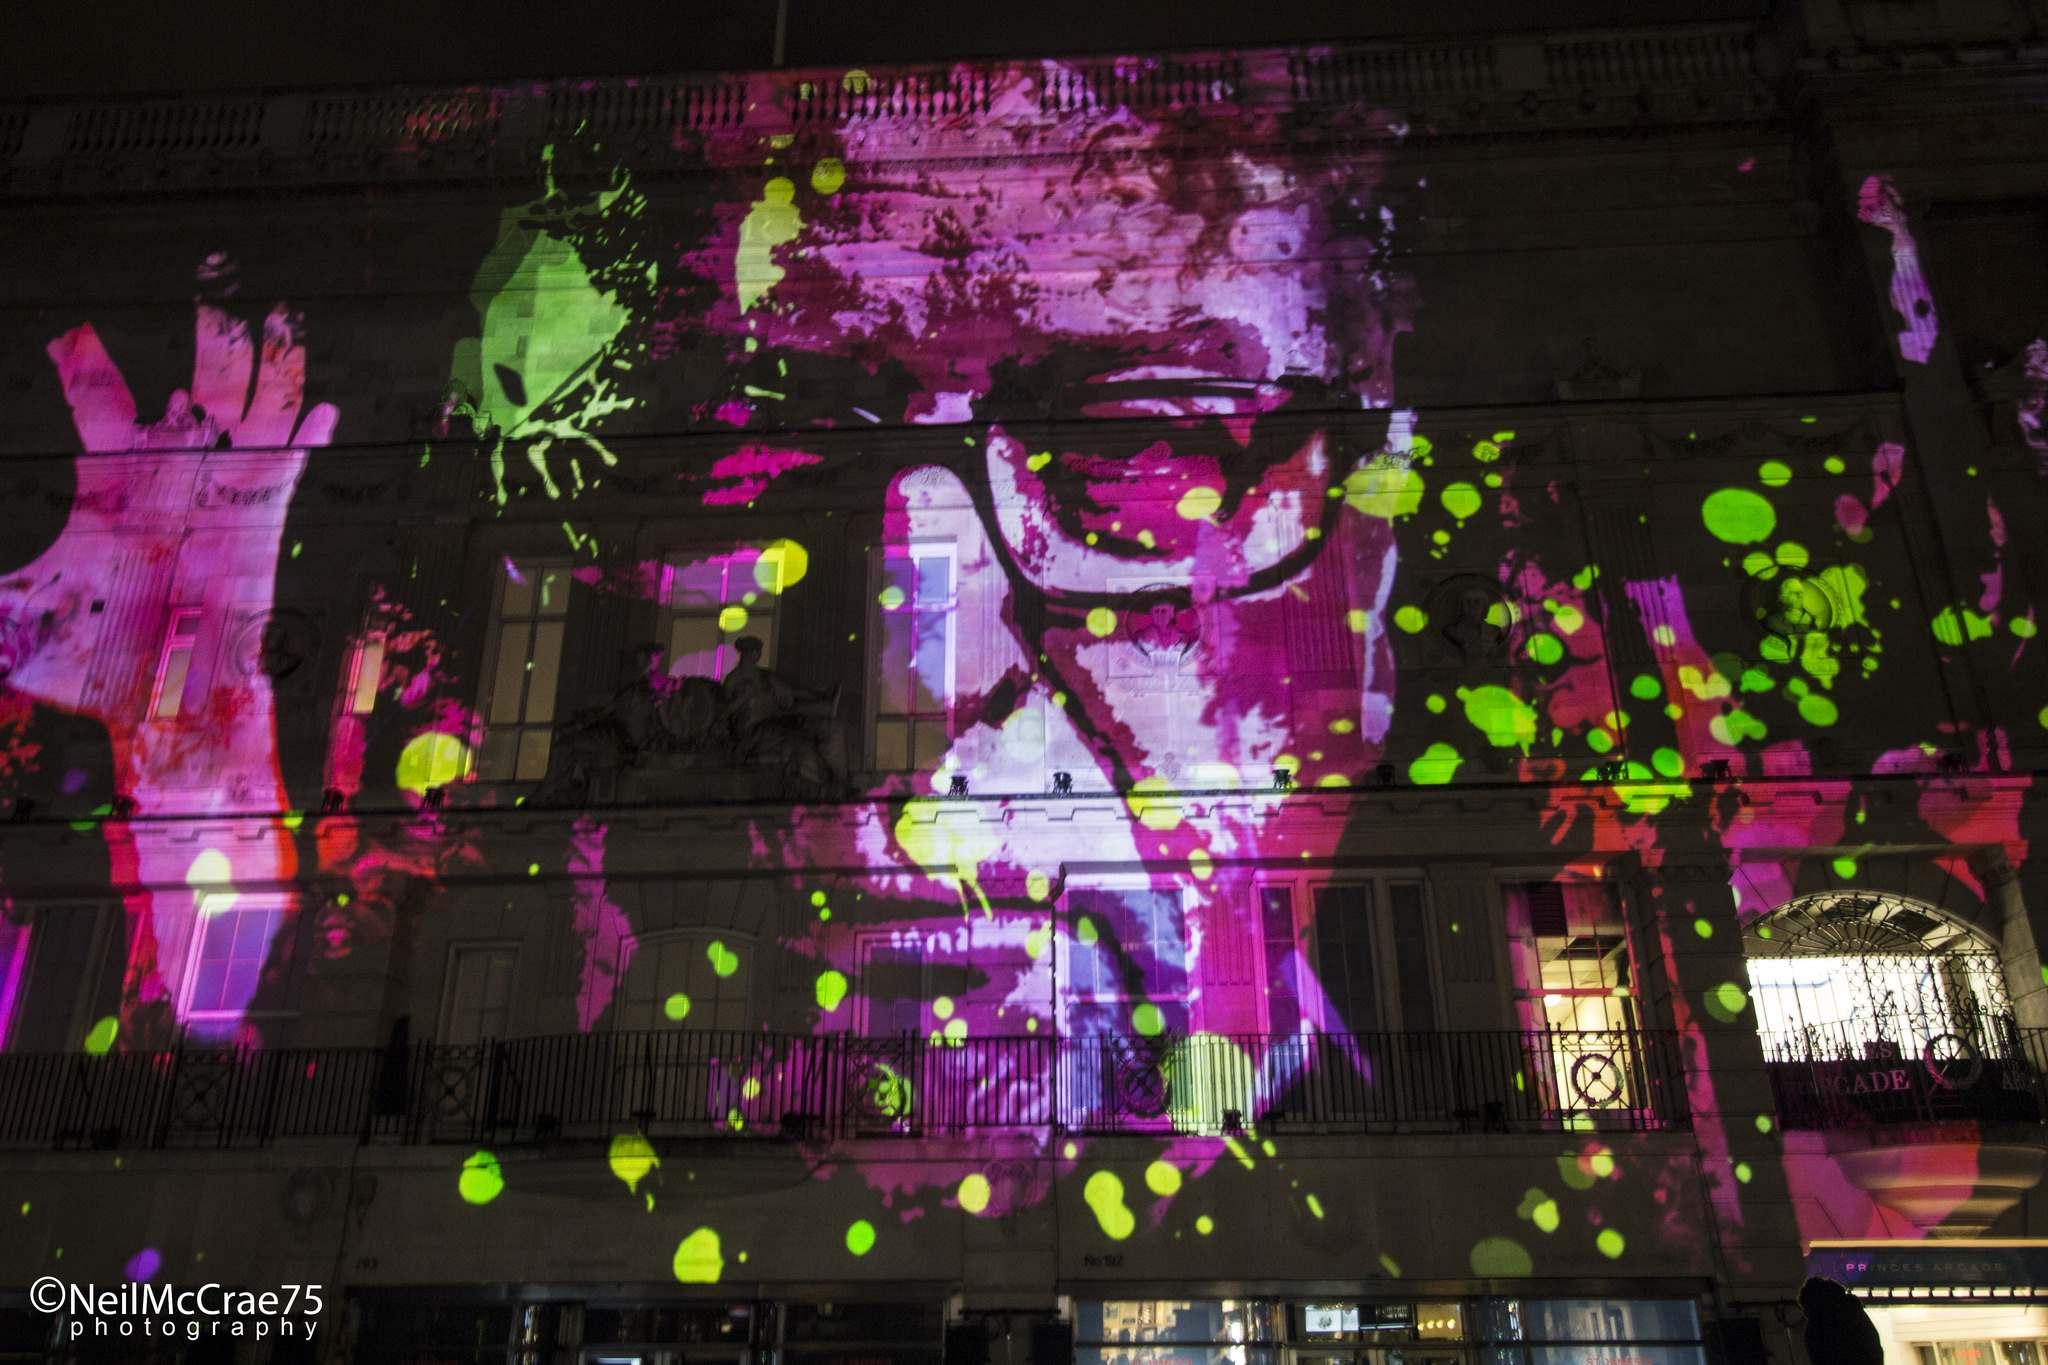 london lumiere festival8 The London Light Lumiere Festival by Neil McCrae